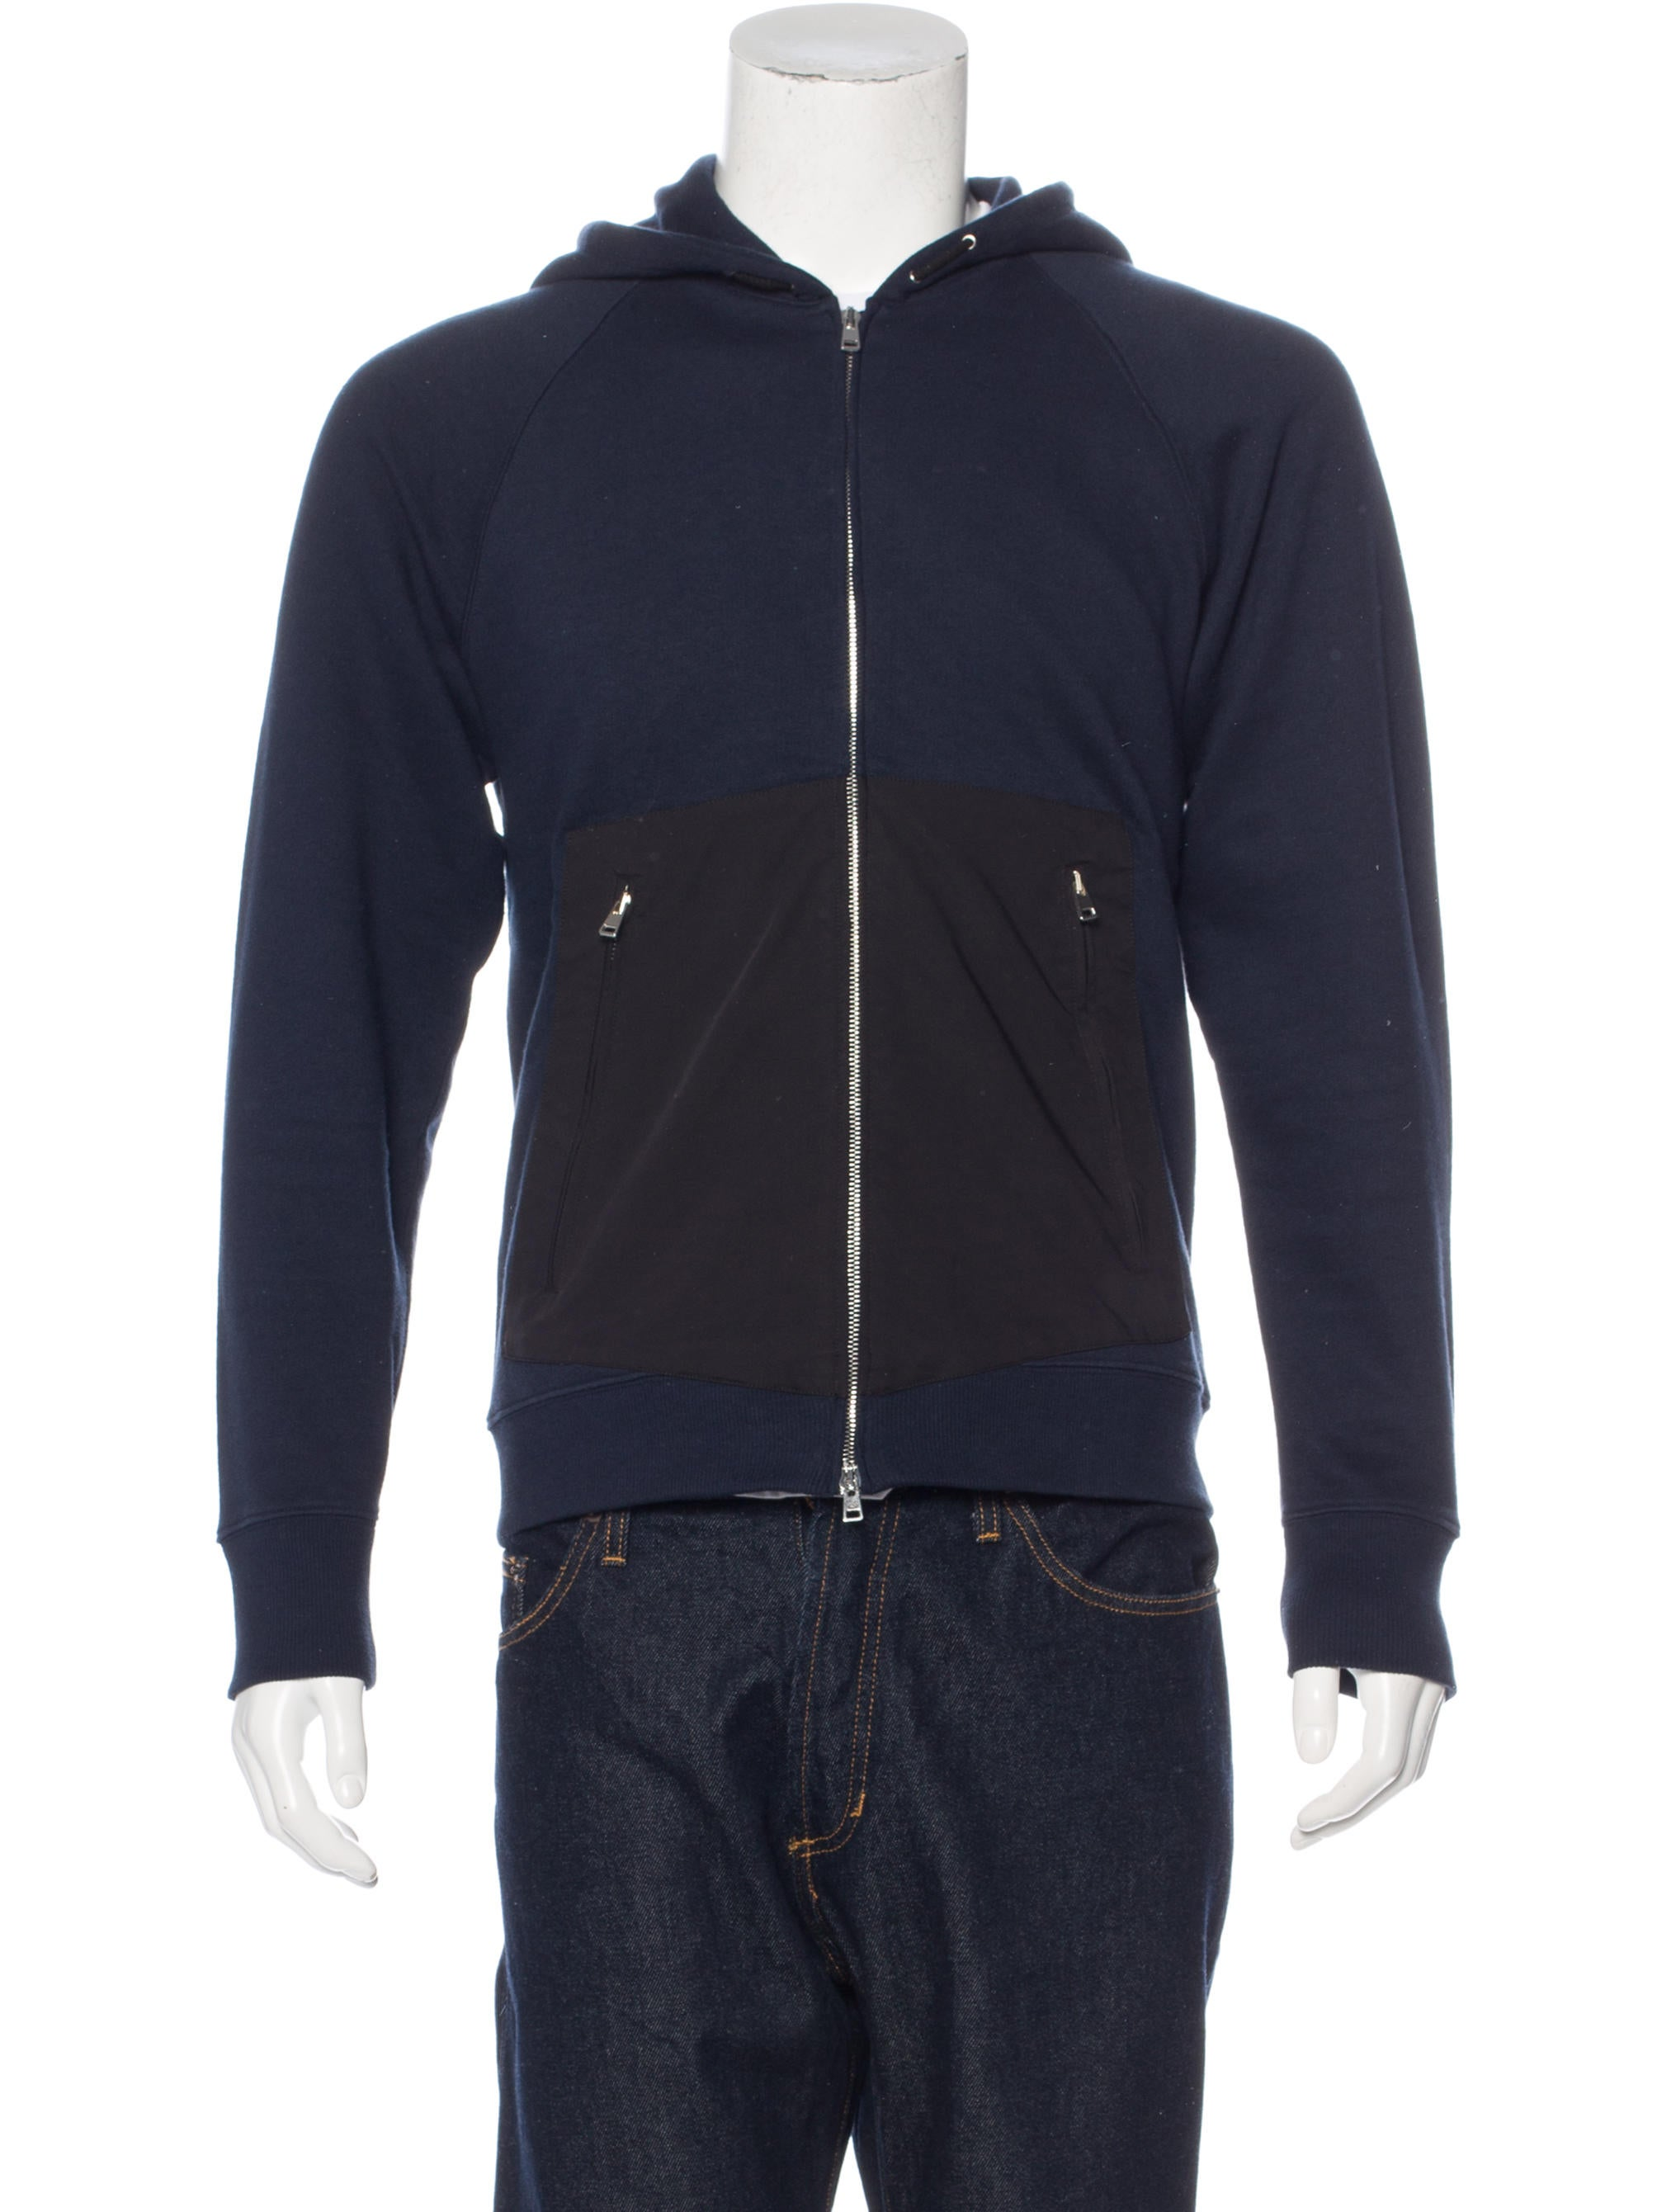 Zip Hoodie Knitting Pattern : Marni Knit Zip Hoodie - Clothing - MAN58002 The RealReal